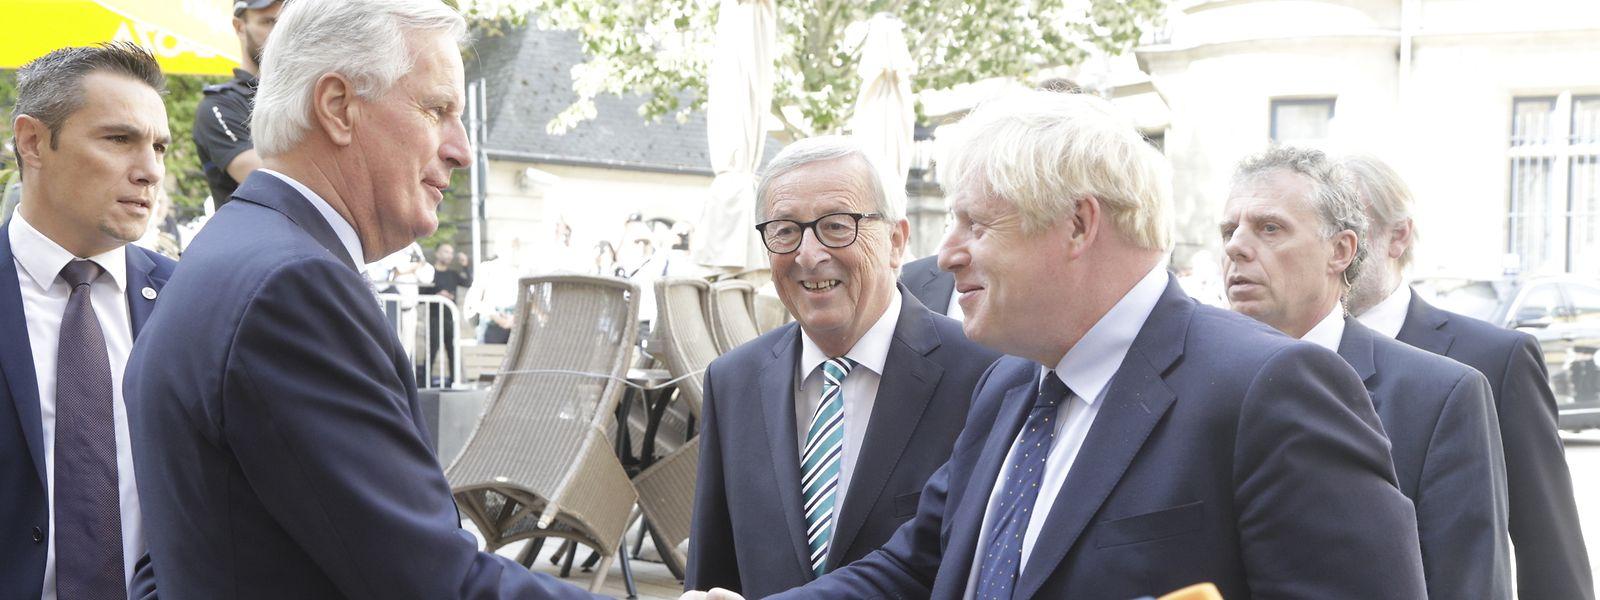 Michel Barnier, Jean-Claude Juncker und Boris Johnson in Luxemburg.